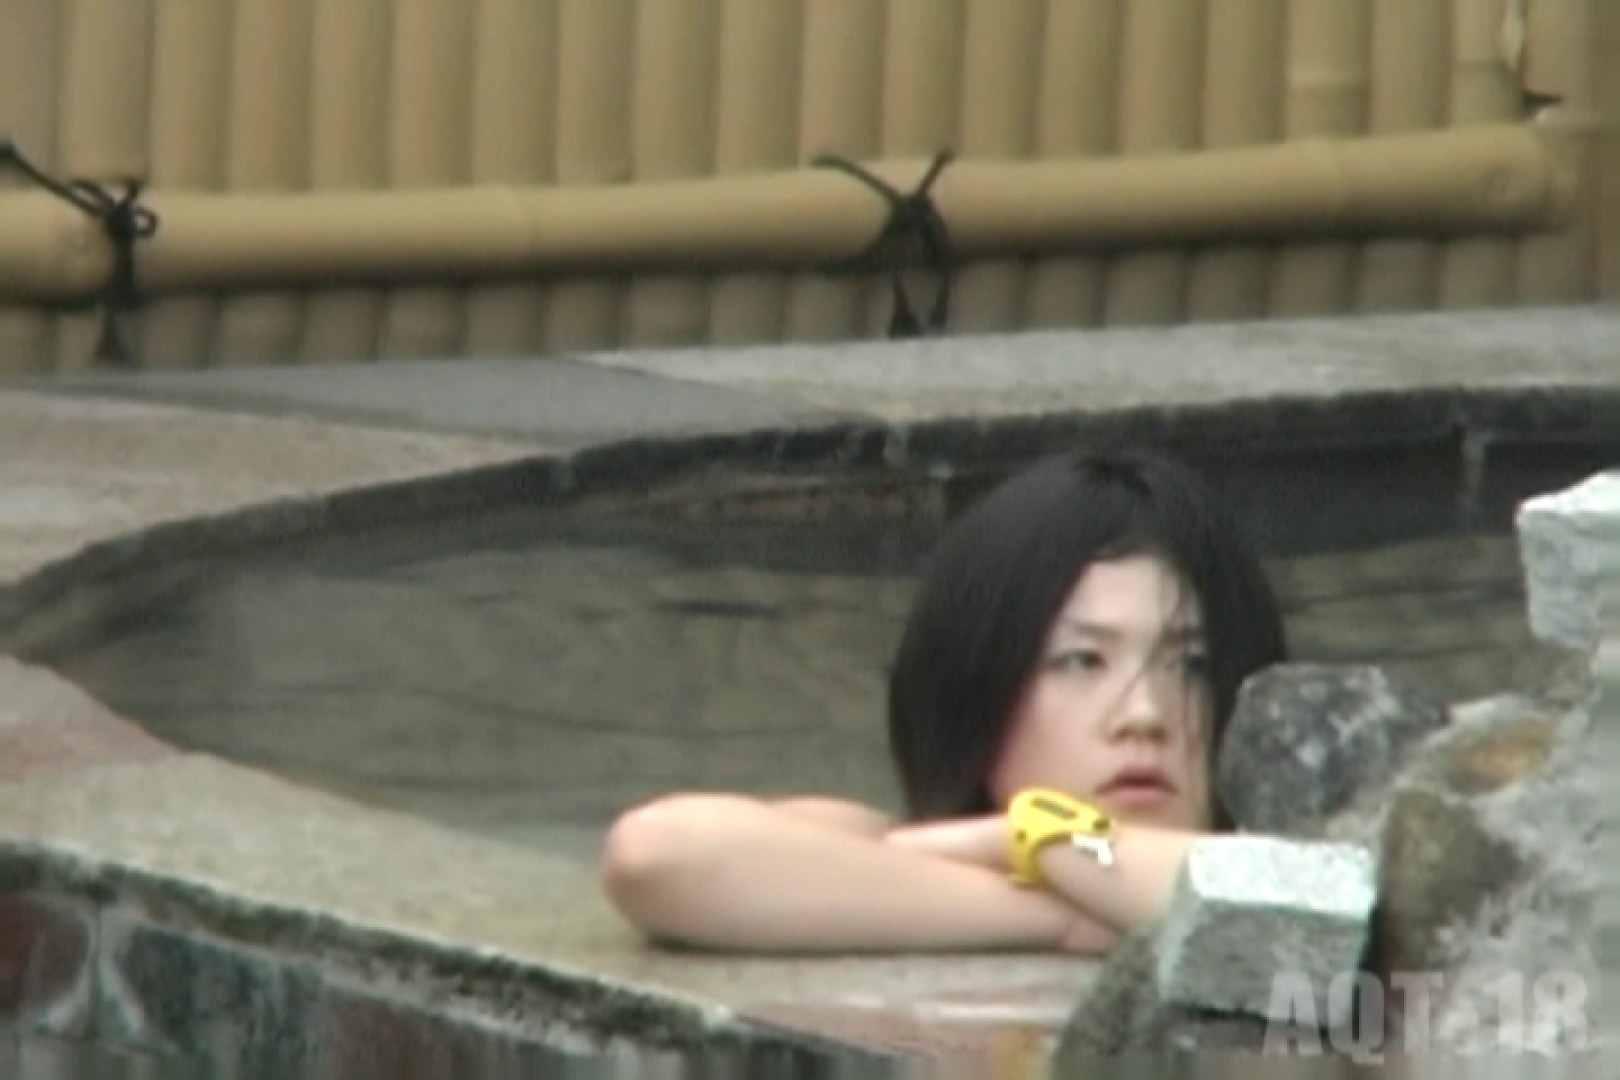 Aquaな露天風呂Vol.859 露天風呂   OLのエロ生活  76連発 19